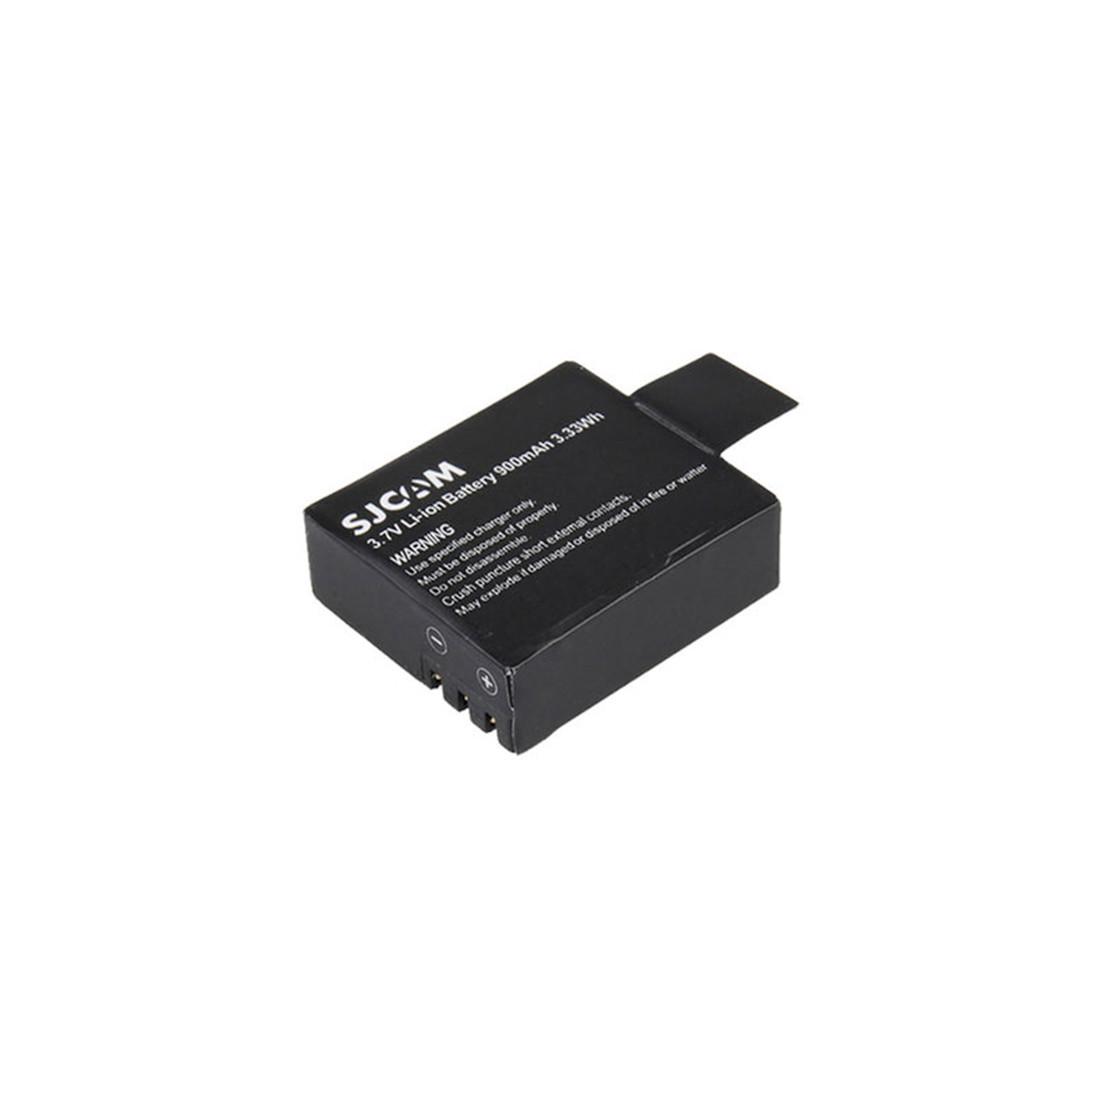 Аккумулятор, SJCAM , SJ200, Аккумулятор для экшн-камер SJ4000 или SJ4000wifi